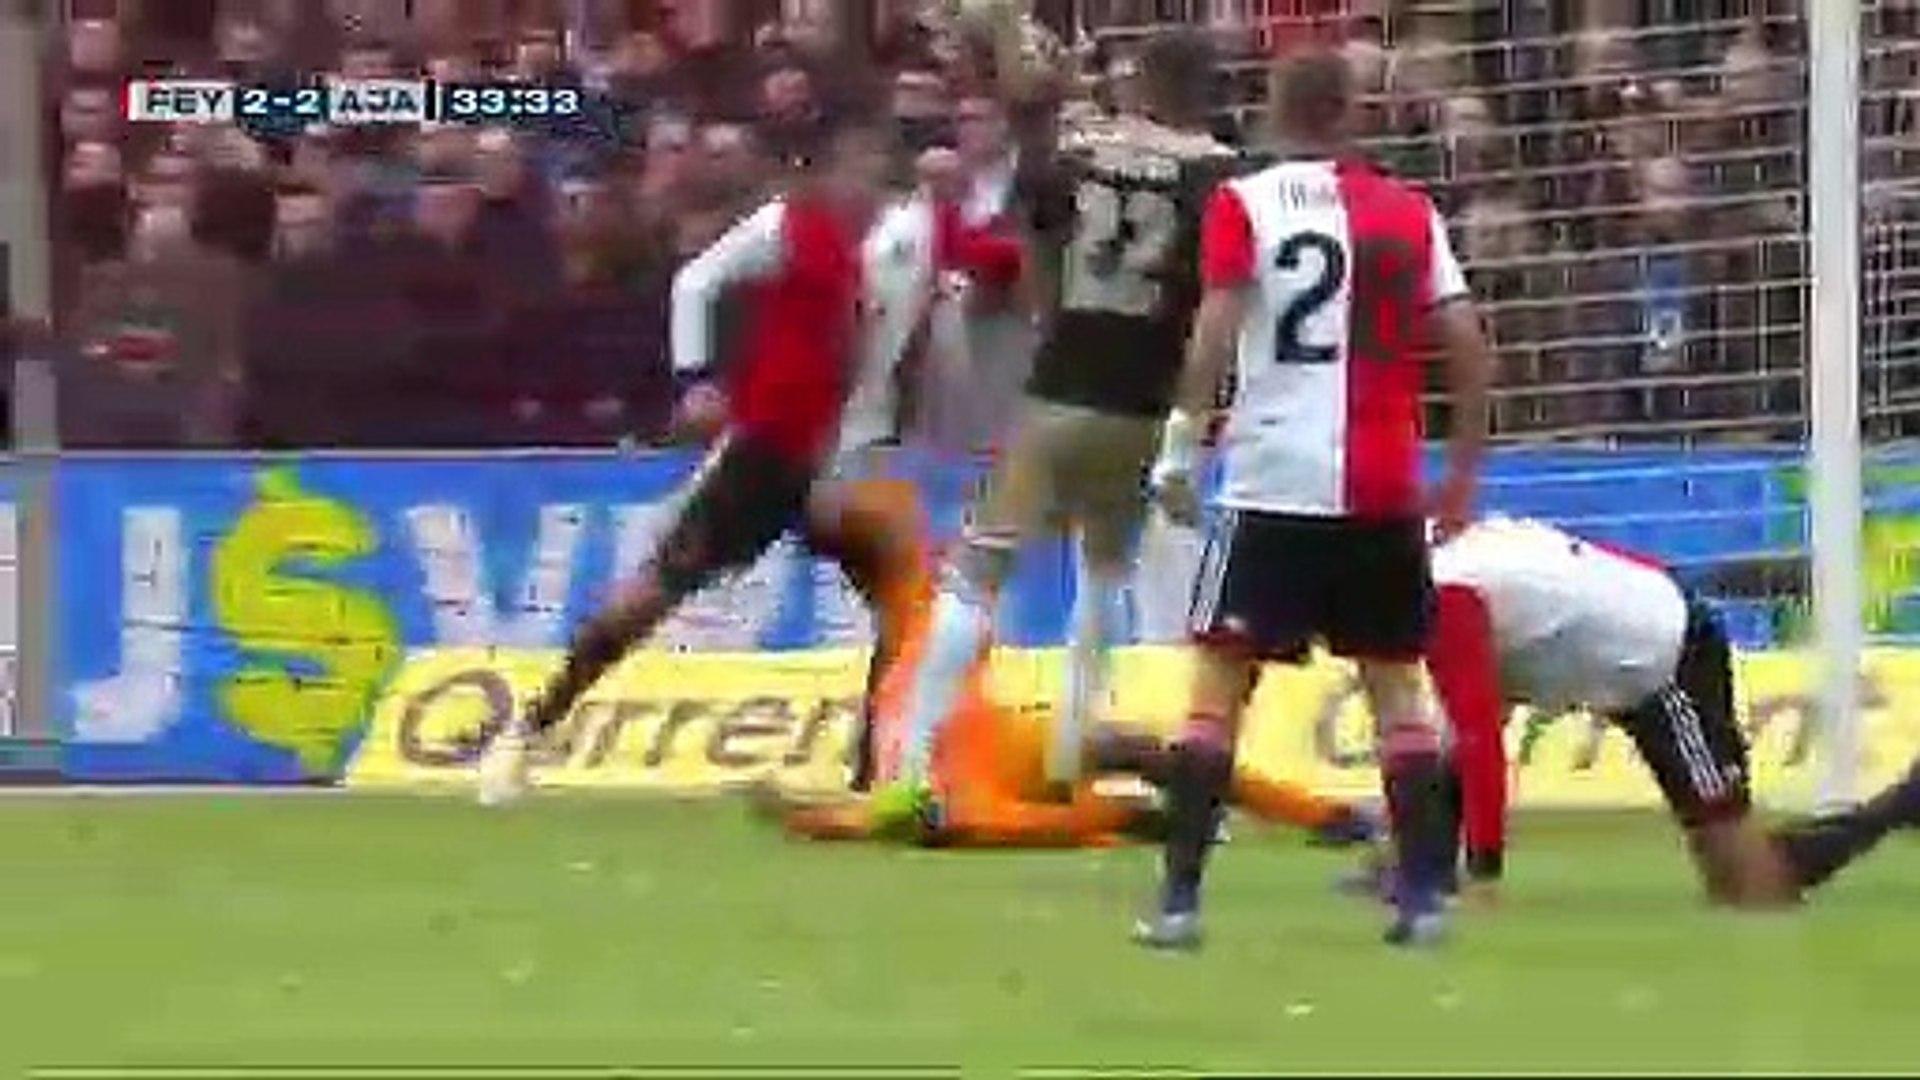 Feyenoord vs Ajax 6-2 All Goals & Highlights 27/01/2019 Eredivisie